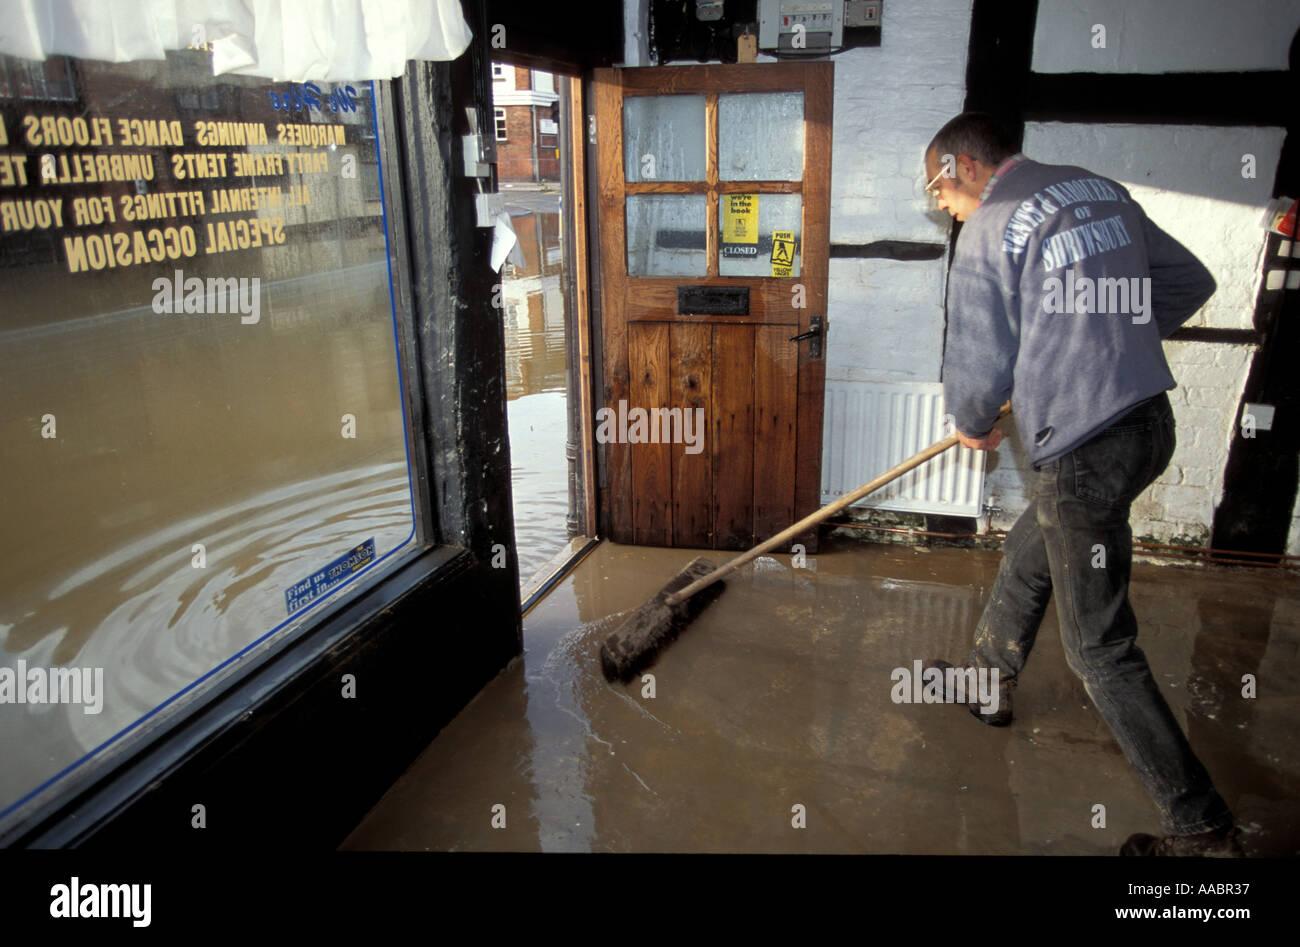 Cleaning up inside a flooded shop in shrewsbury Worcestershire England UK uk united kingdom great britain - Stock Image